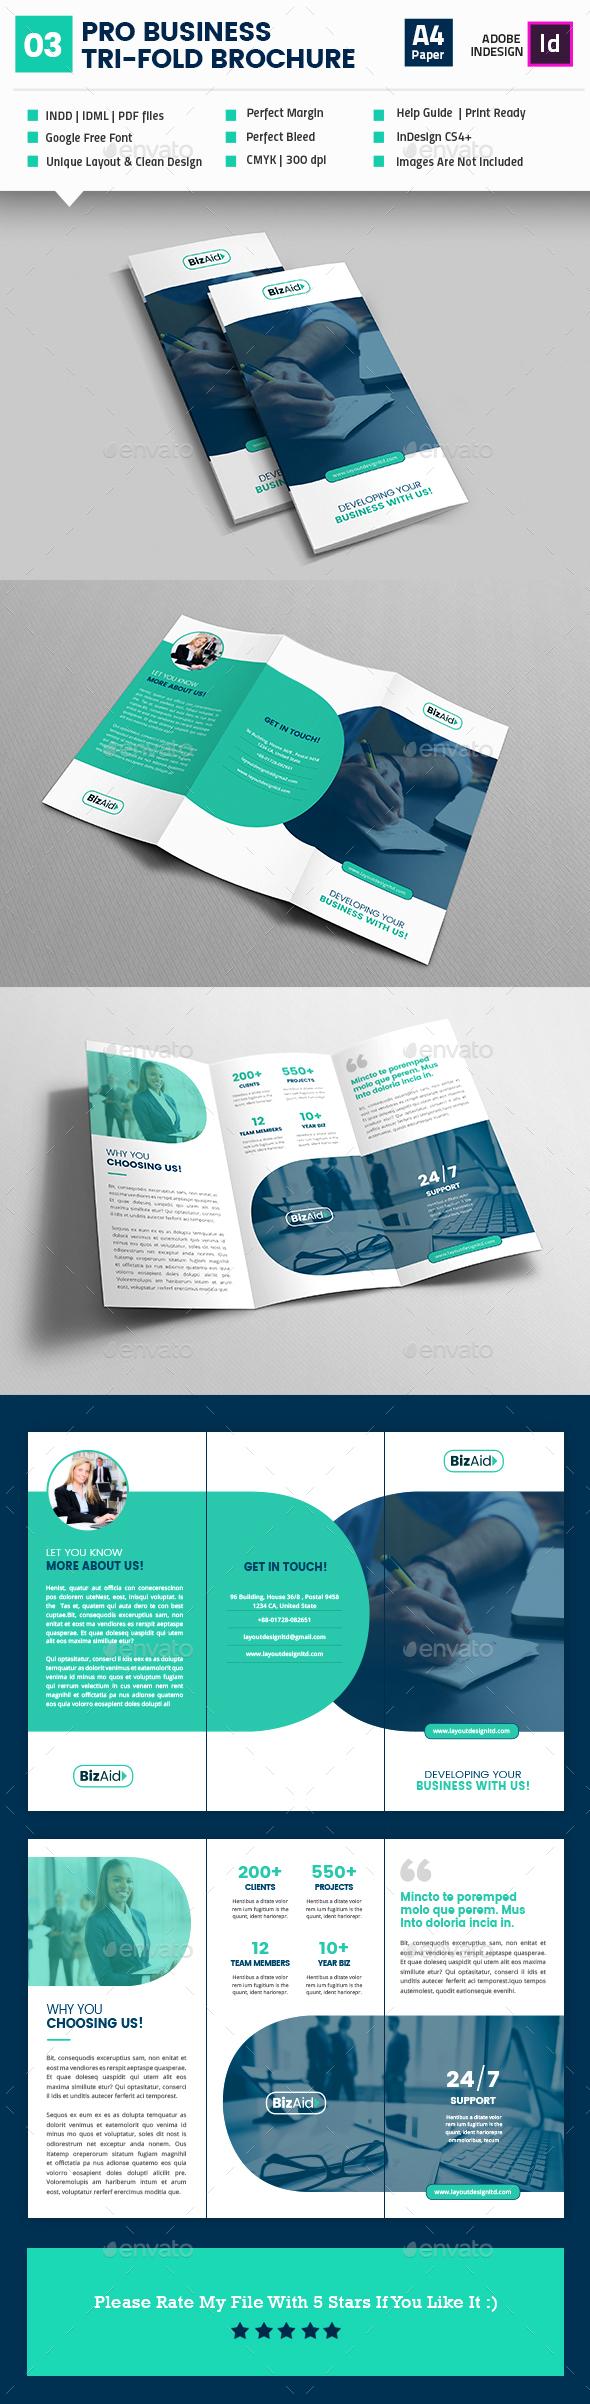 pro business tri fold brochure template indesign indd brochure